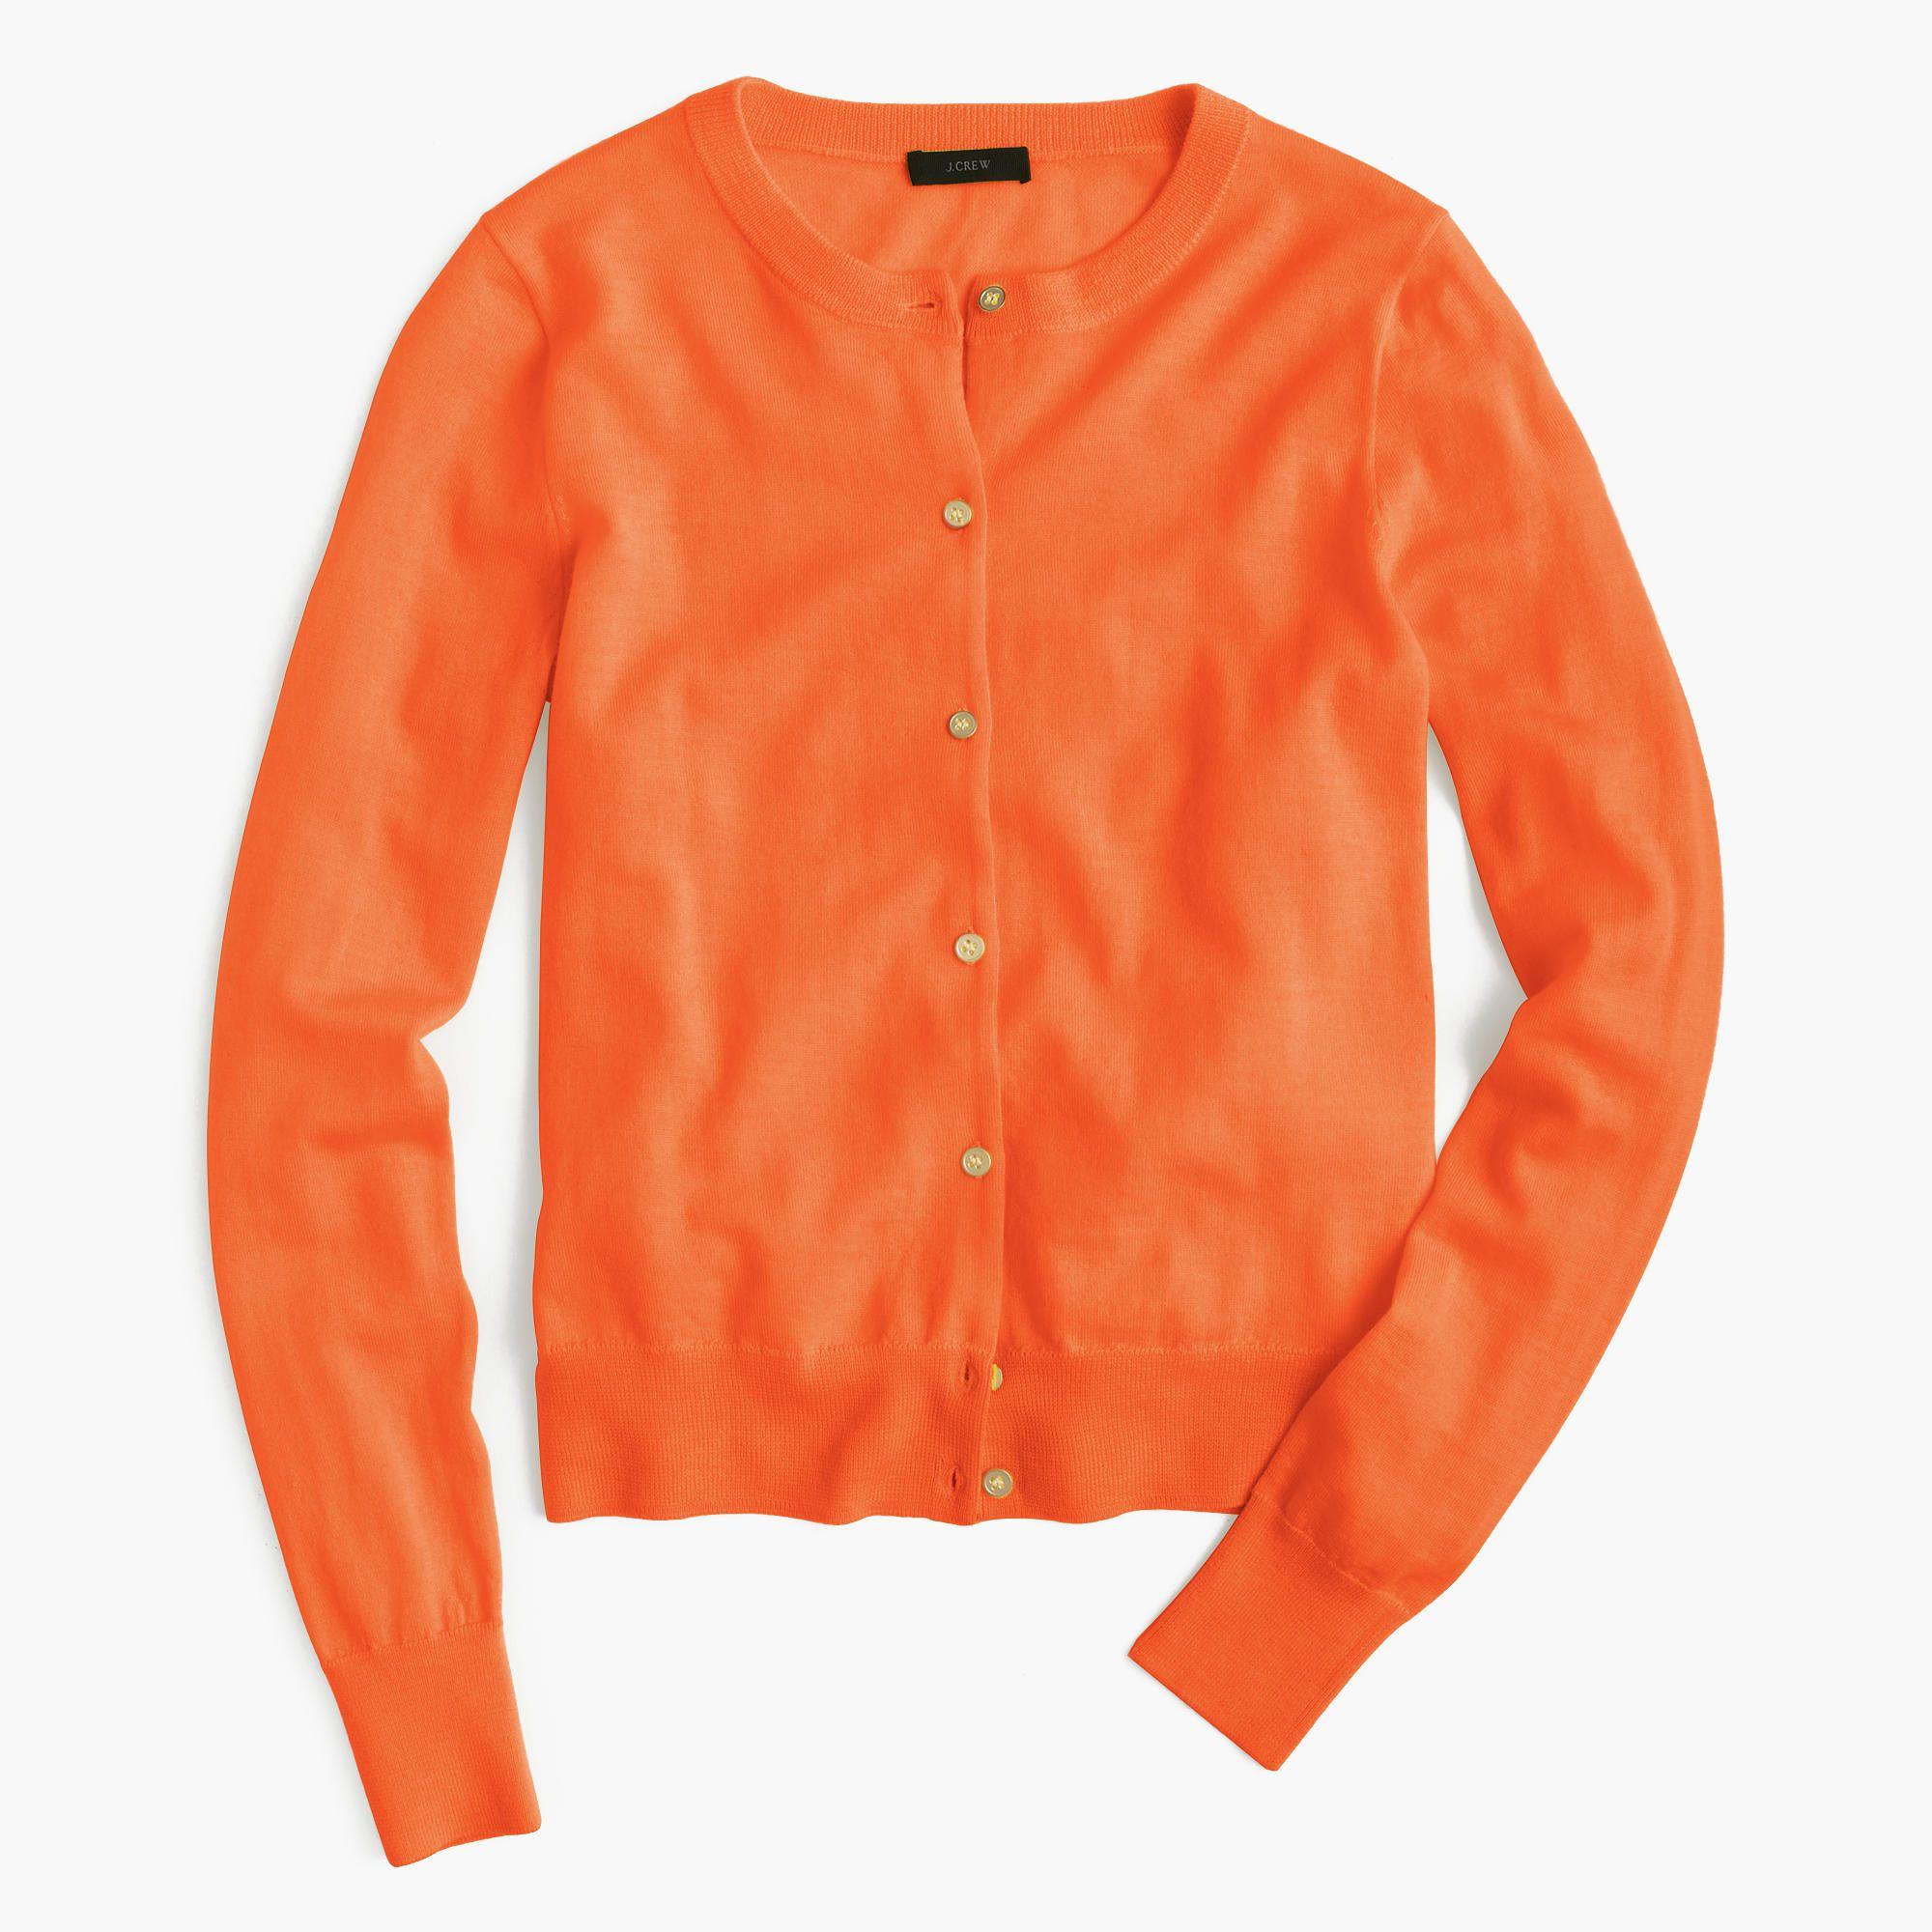 Lightweight wool Jackie cardigan sweater in Neon Orange | Neon ...